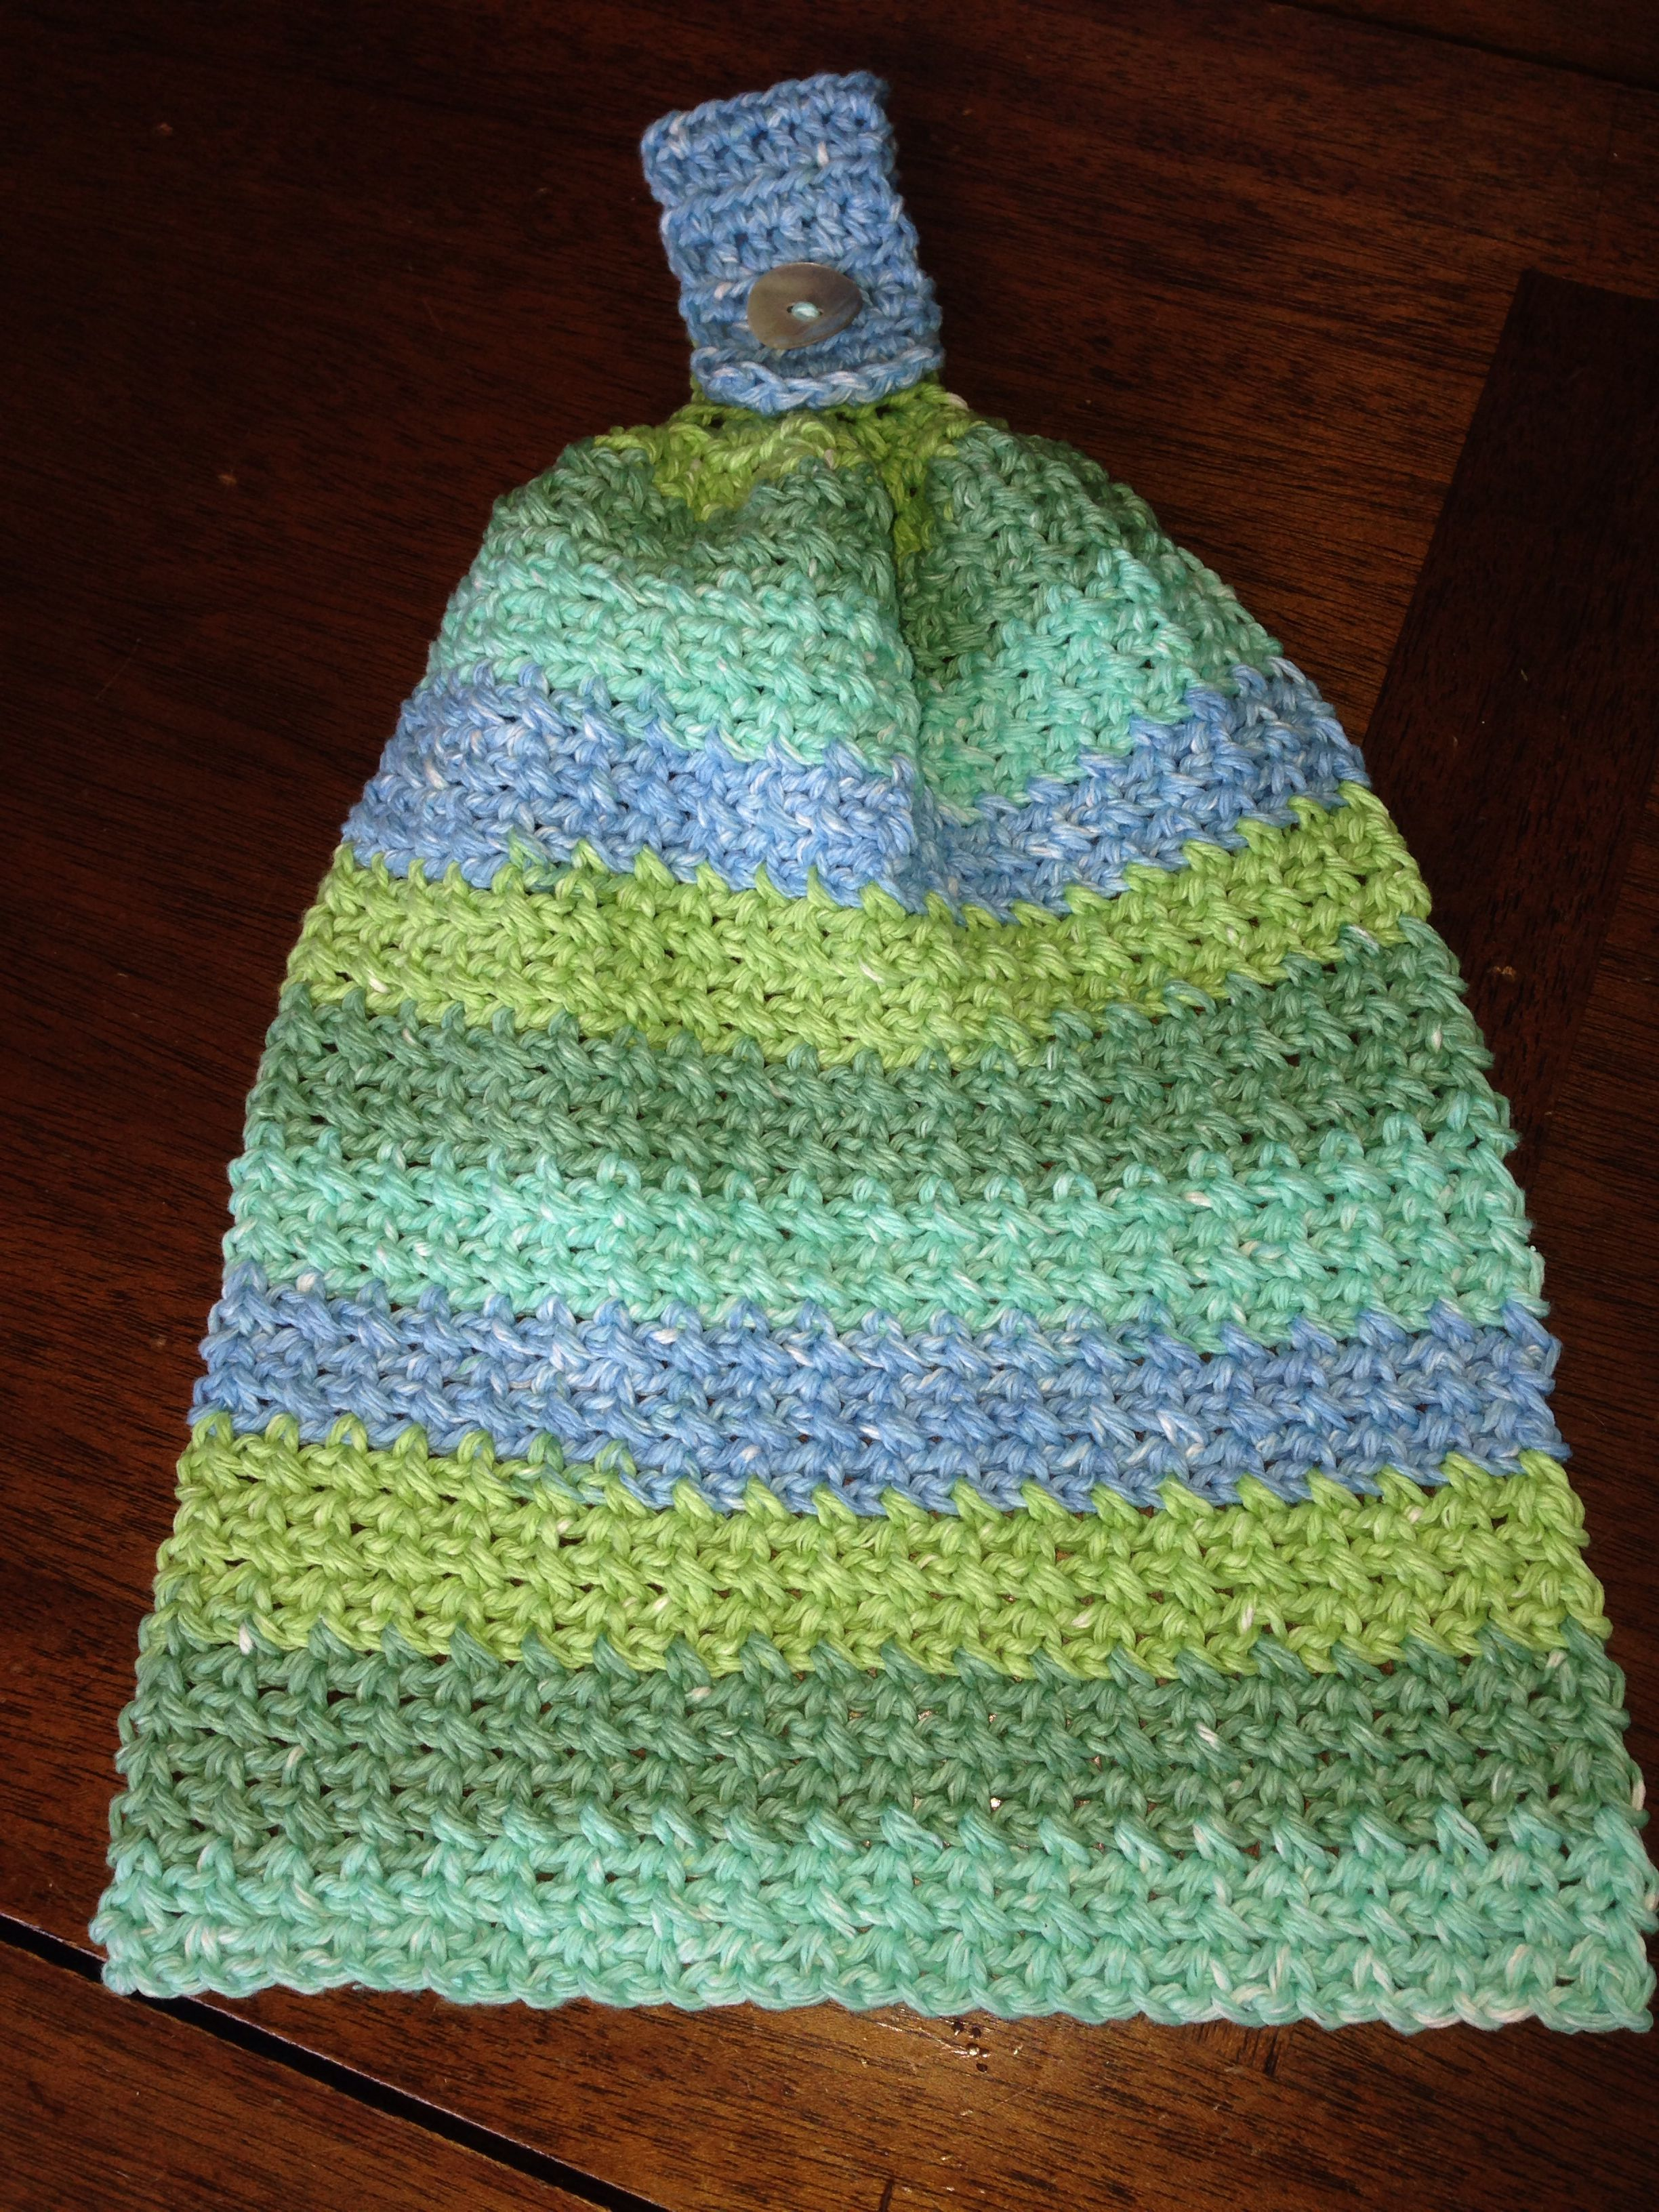 Hanging Towel Crochet Dish Towels Crochet Kitchen